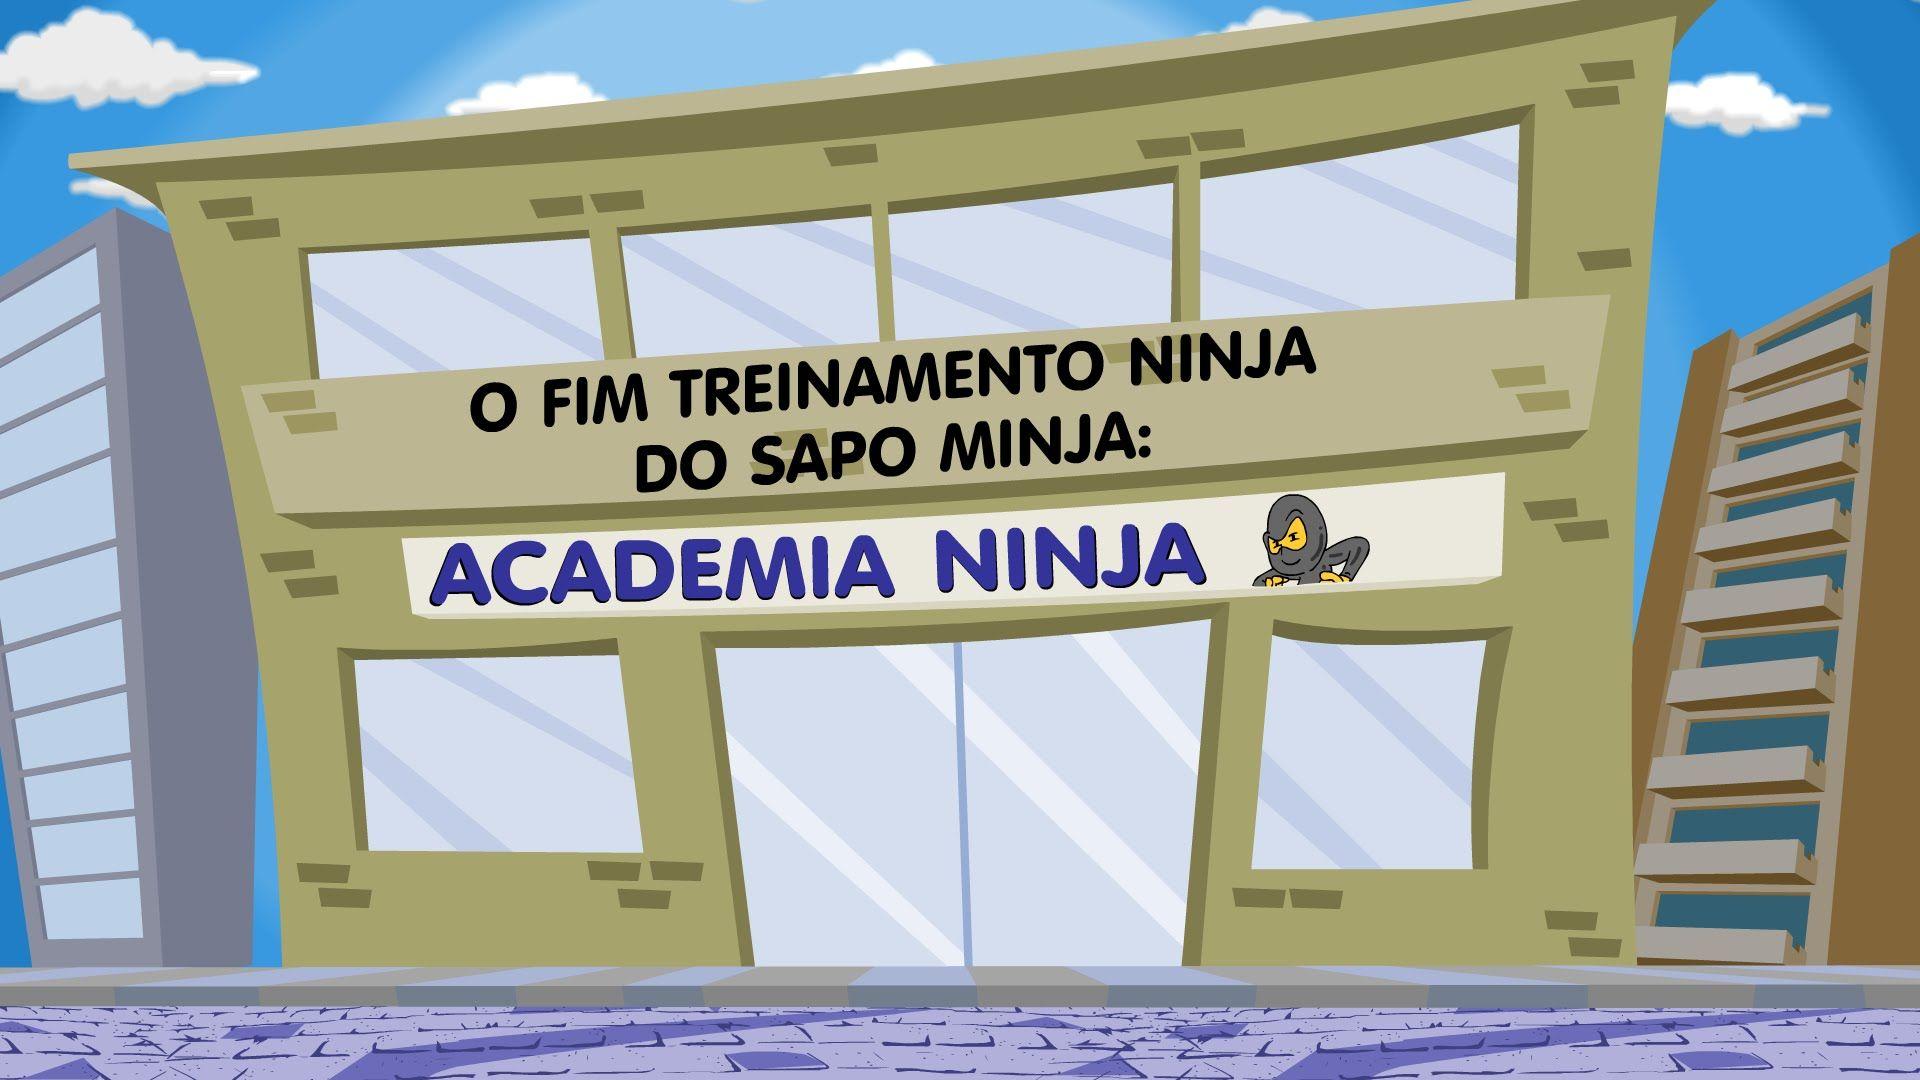 O episódio final do Treinamento Ninja do Sapo Minja